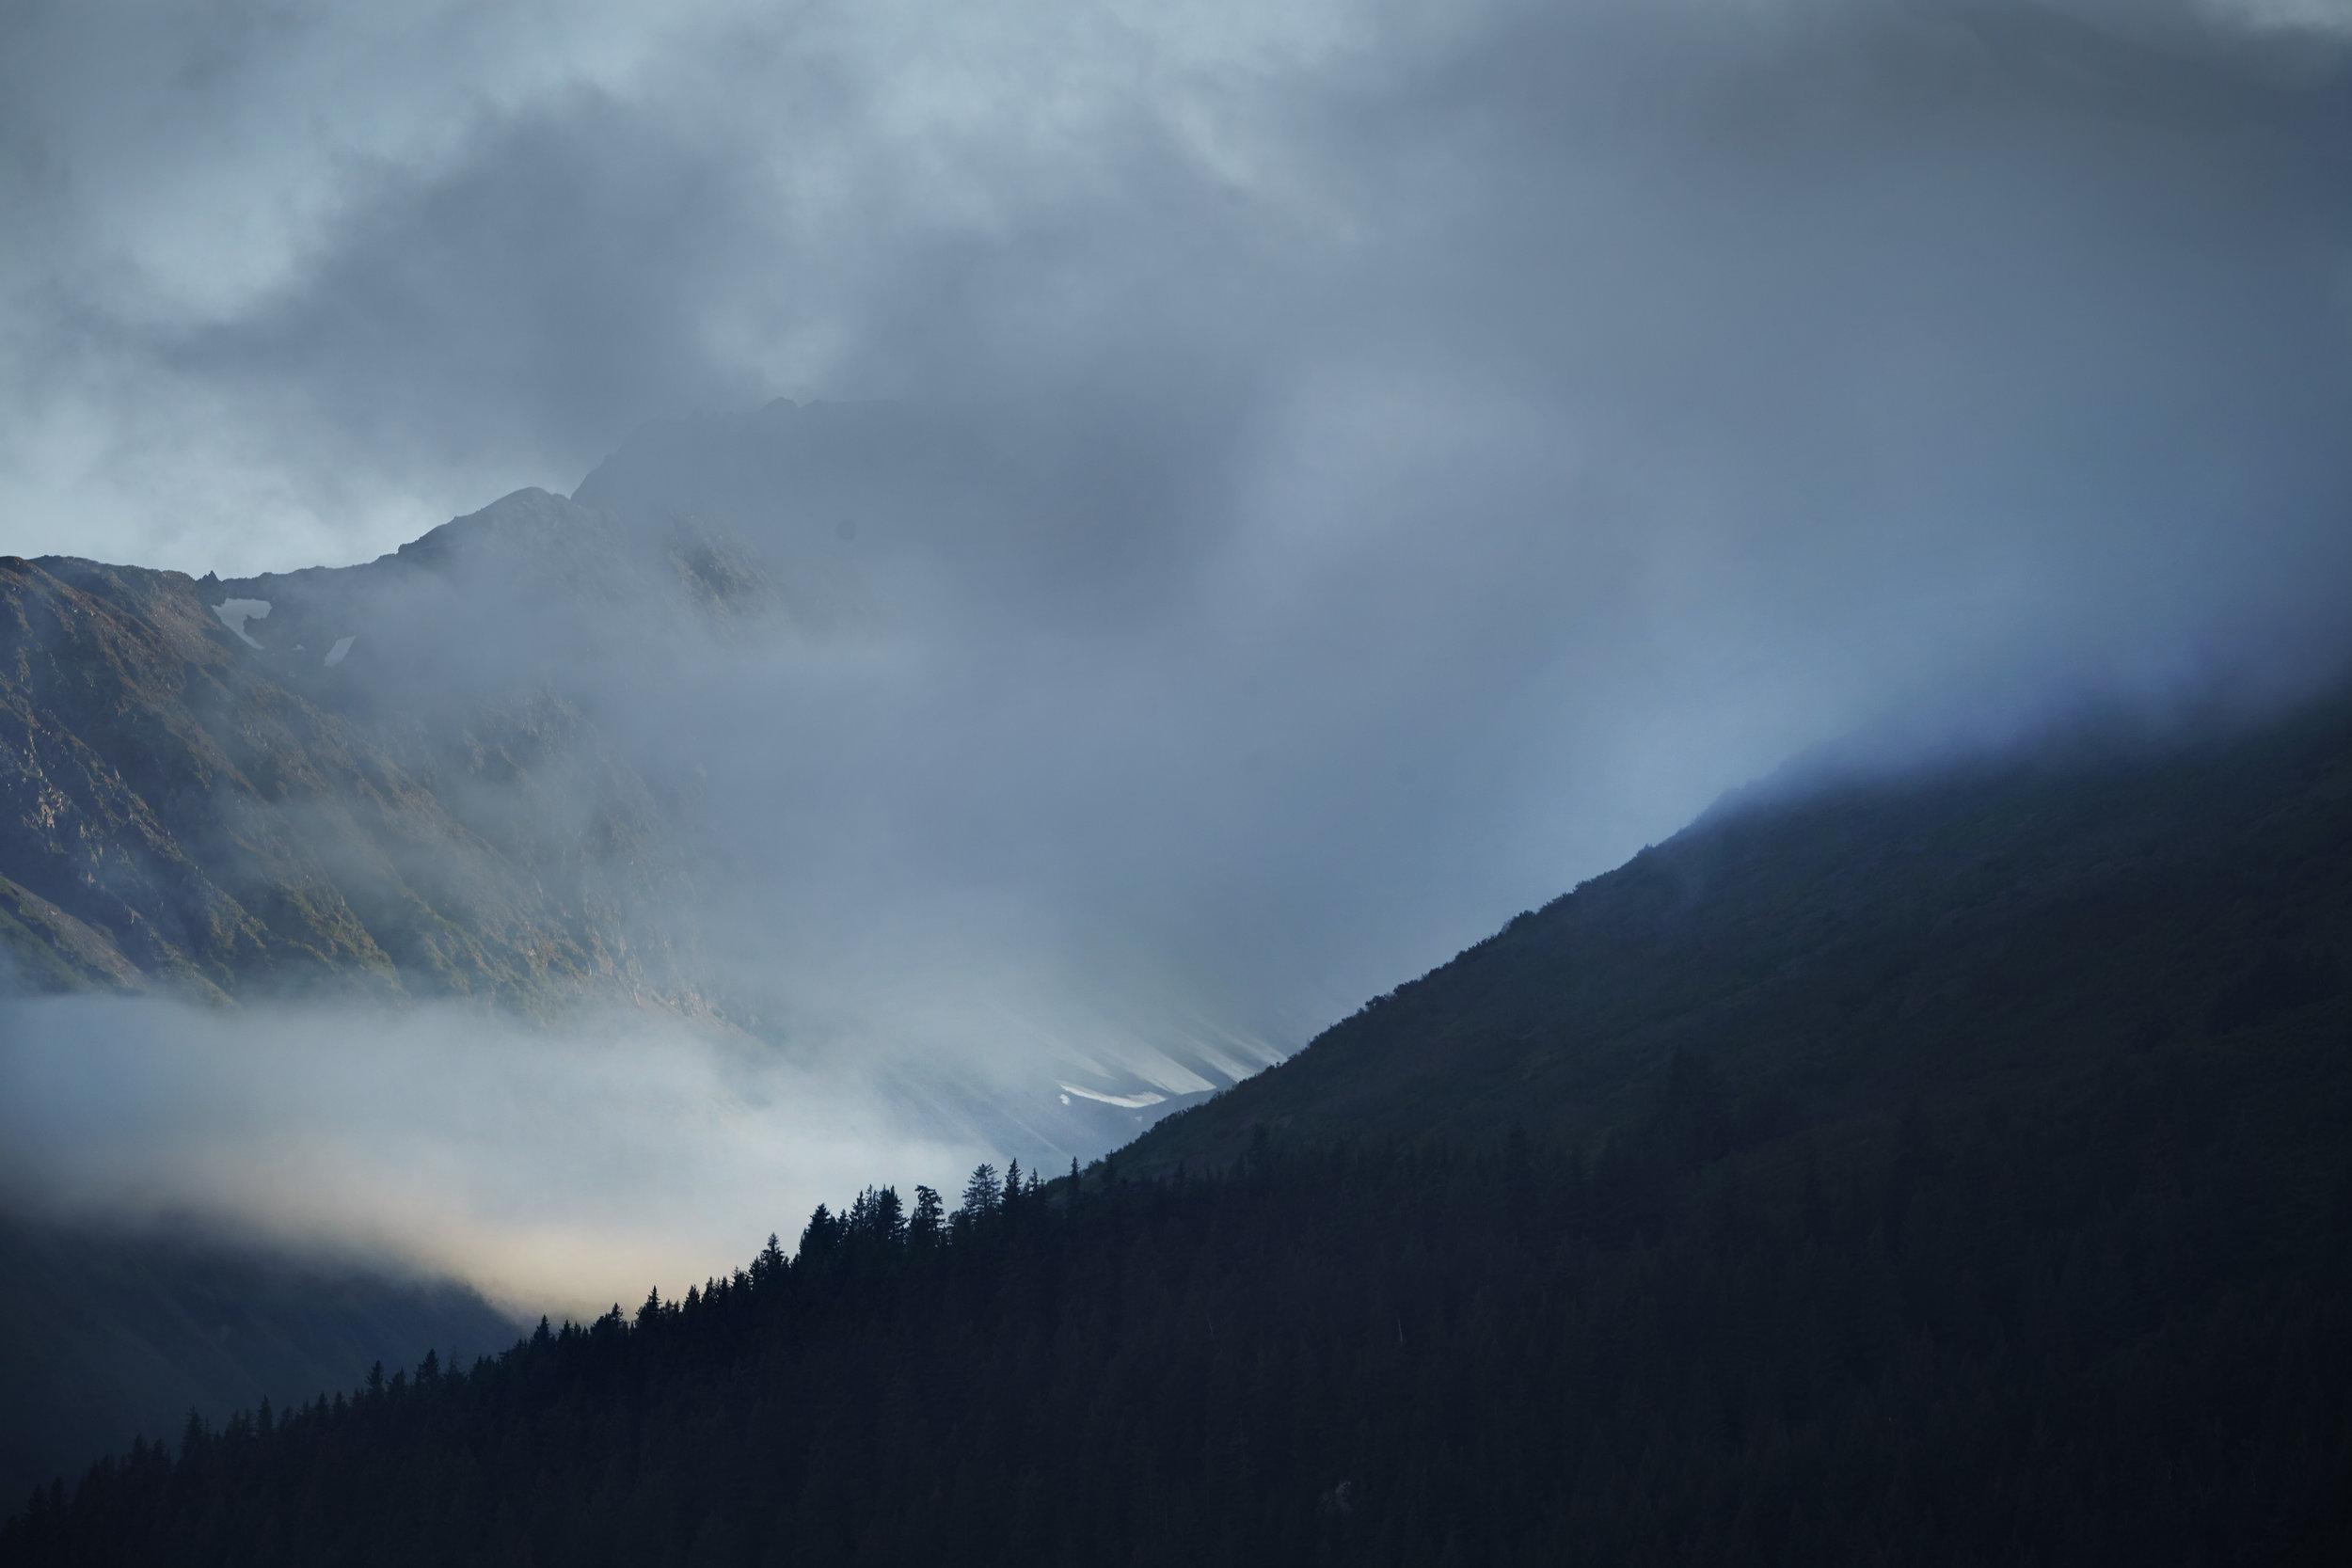 Alaska, 2013 #926